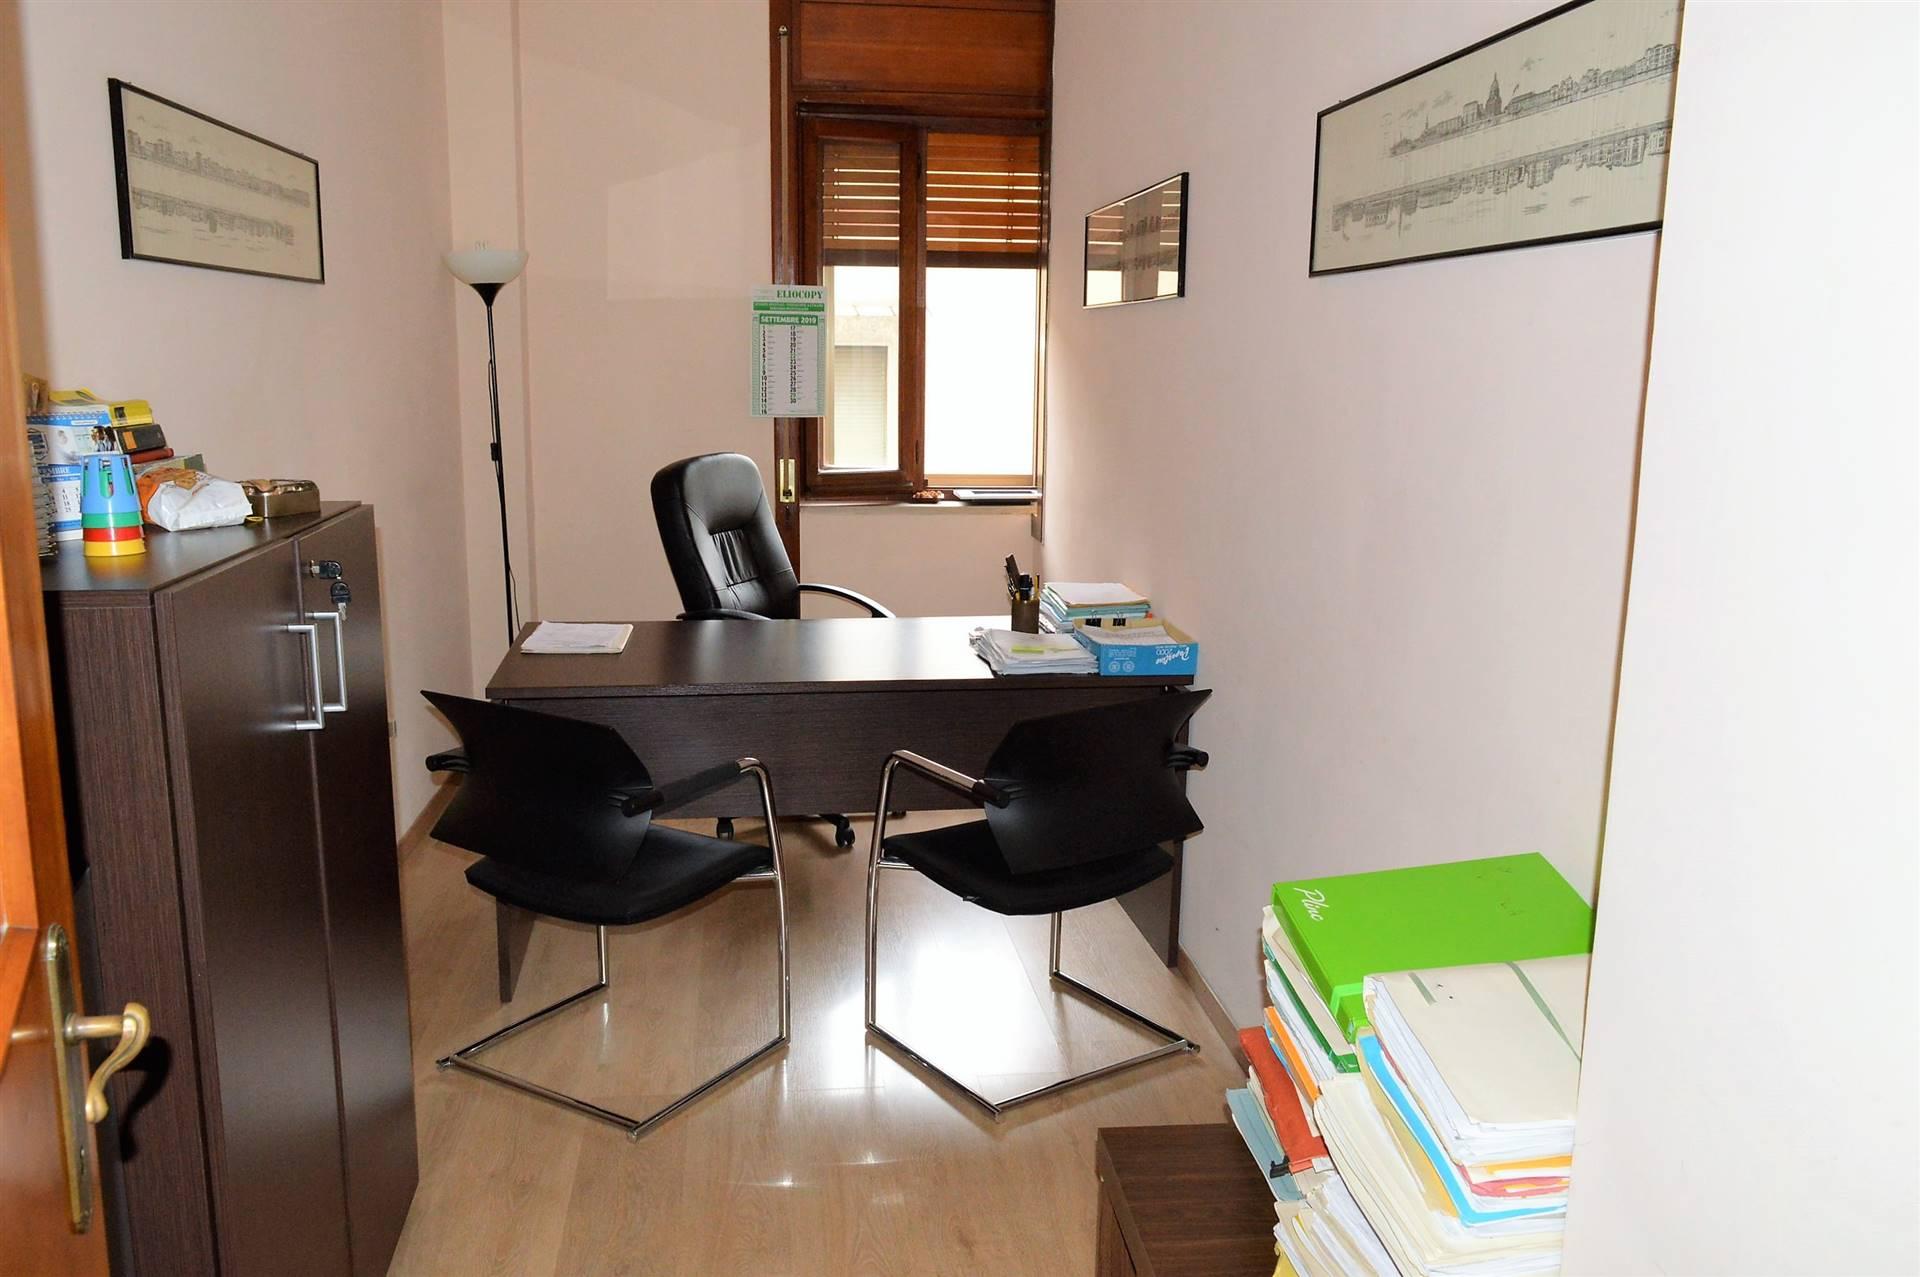 AF851B-Ufficio-SANTA-MARIA-CAPUA-VETERE-Via-Giuseppe-Bonaparte